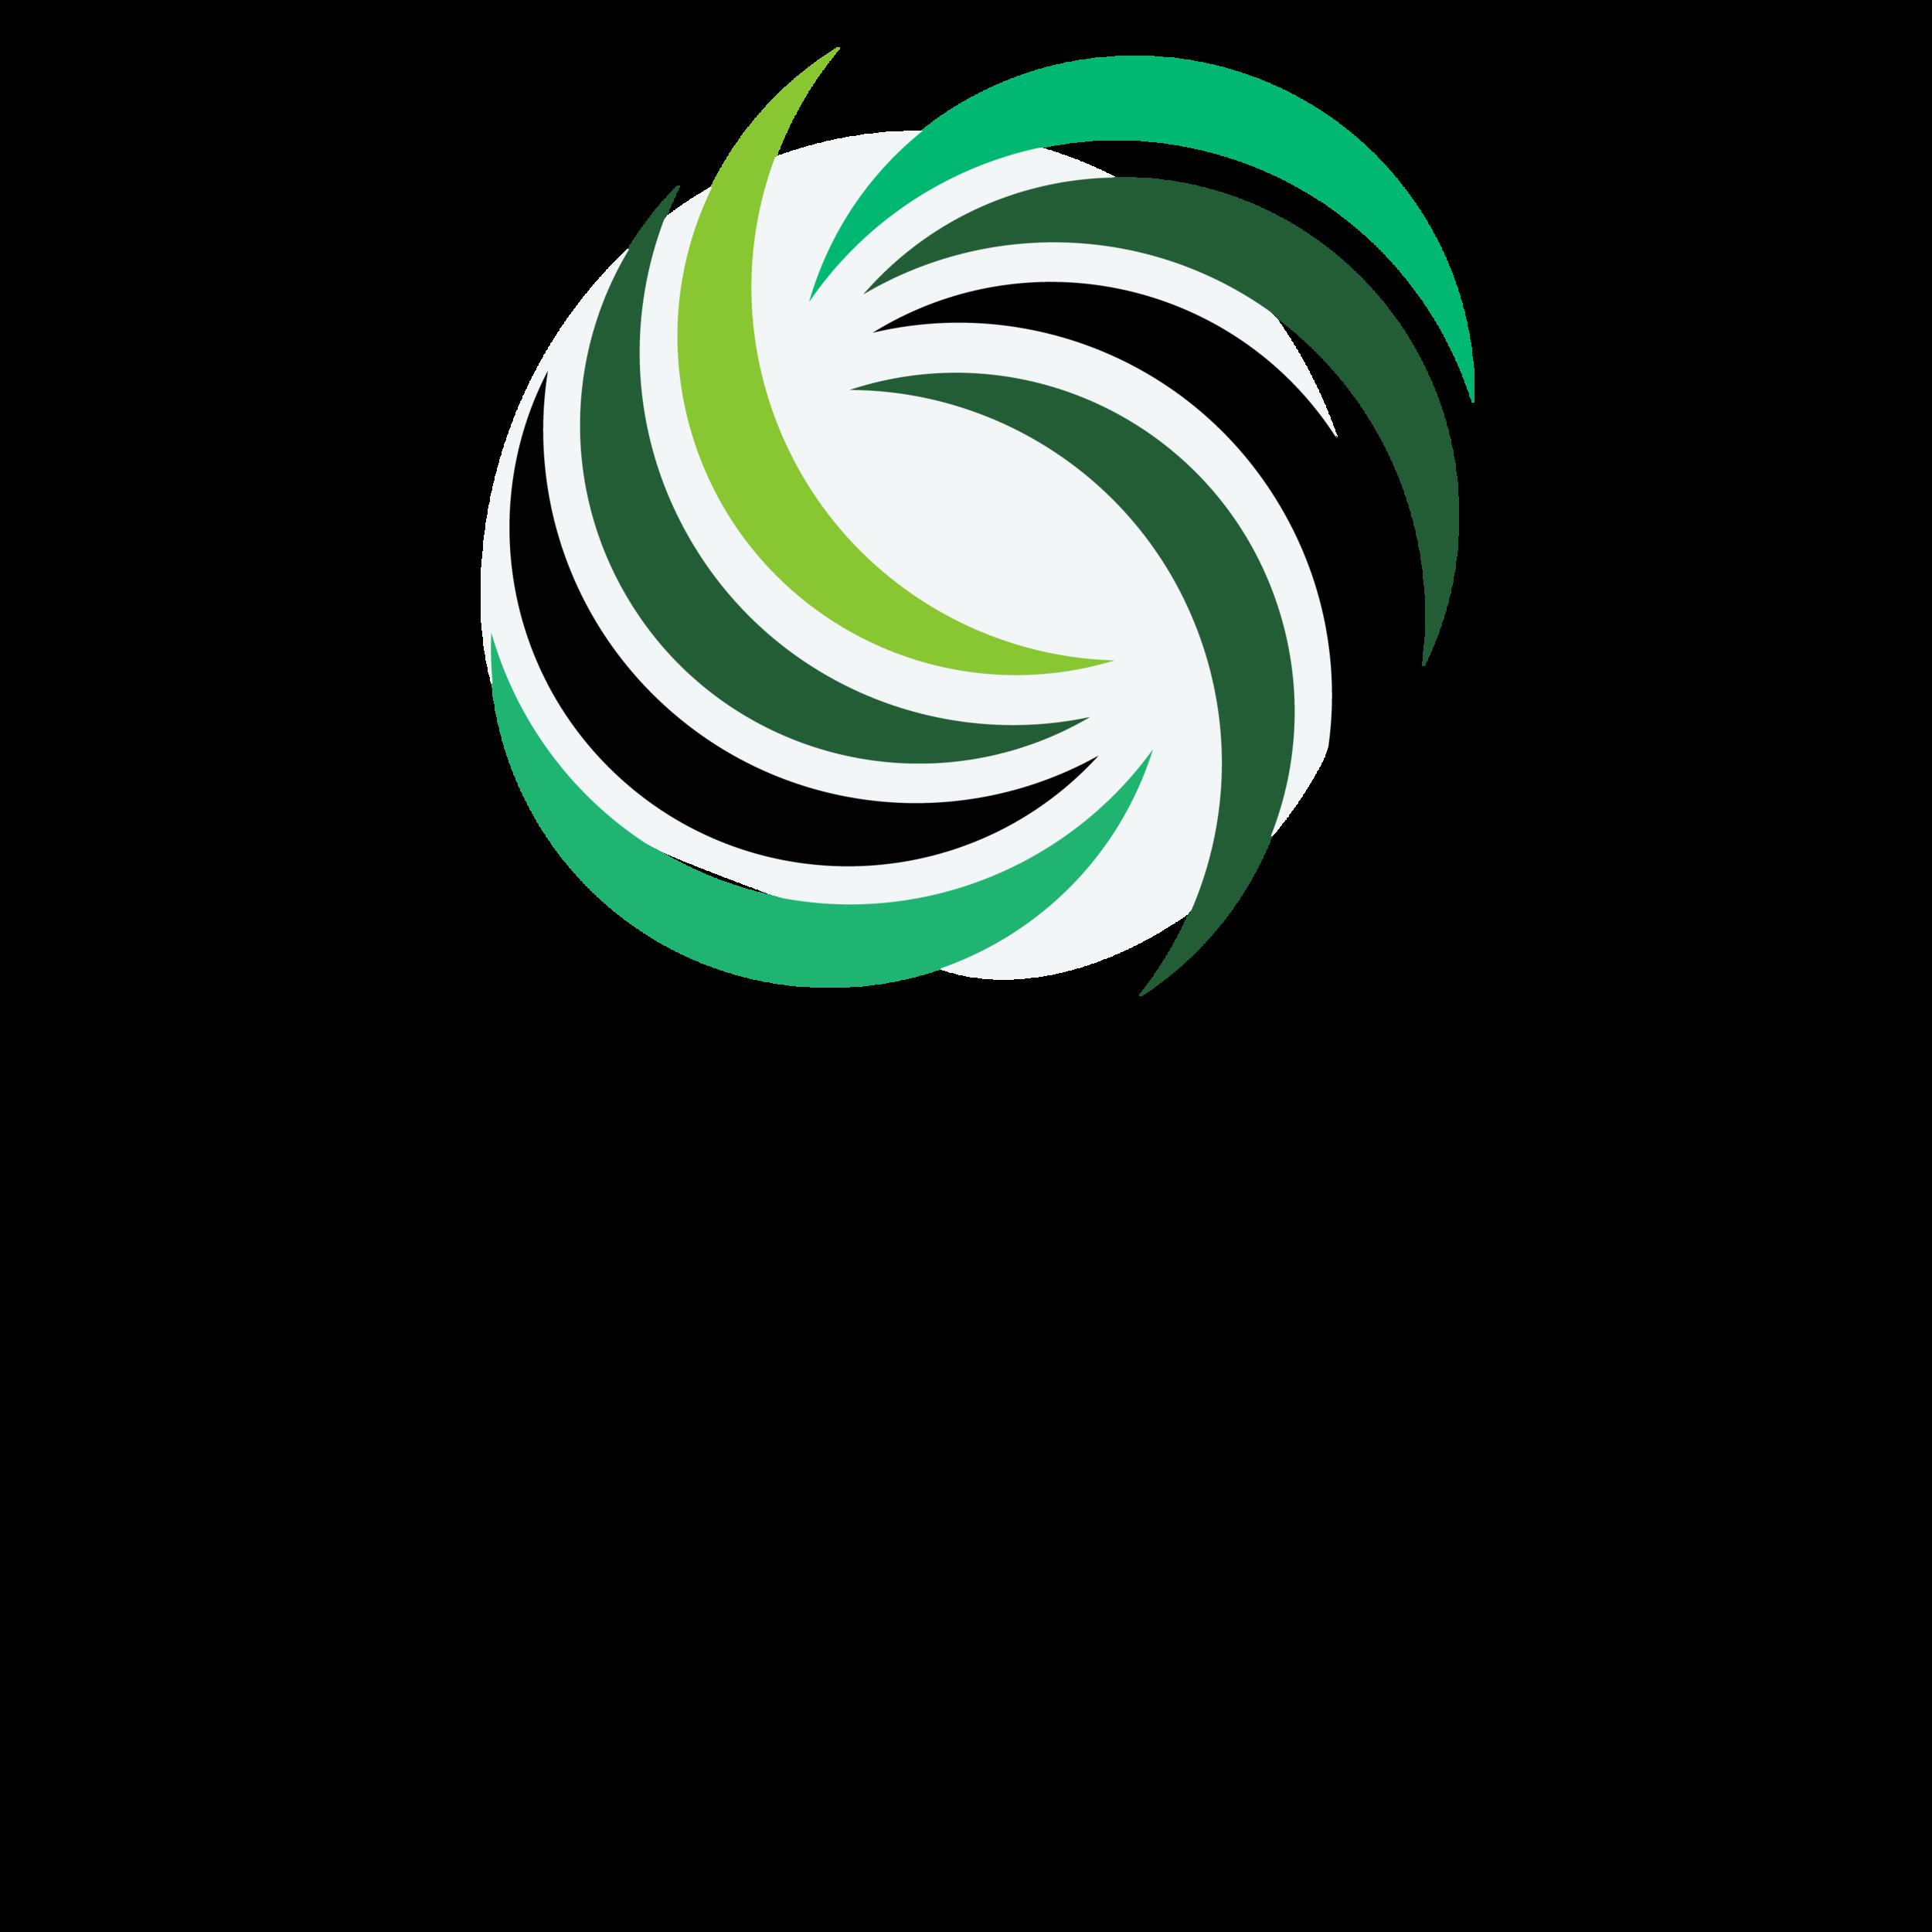 RKG_Logo_OFFICIAL-01.png